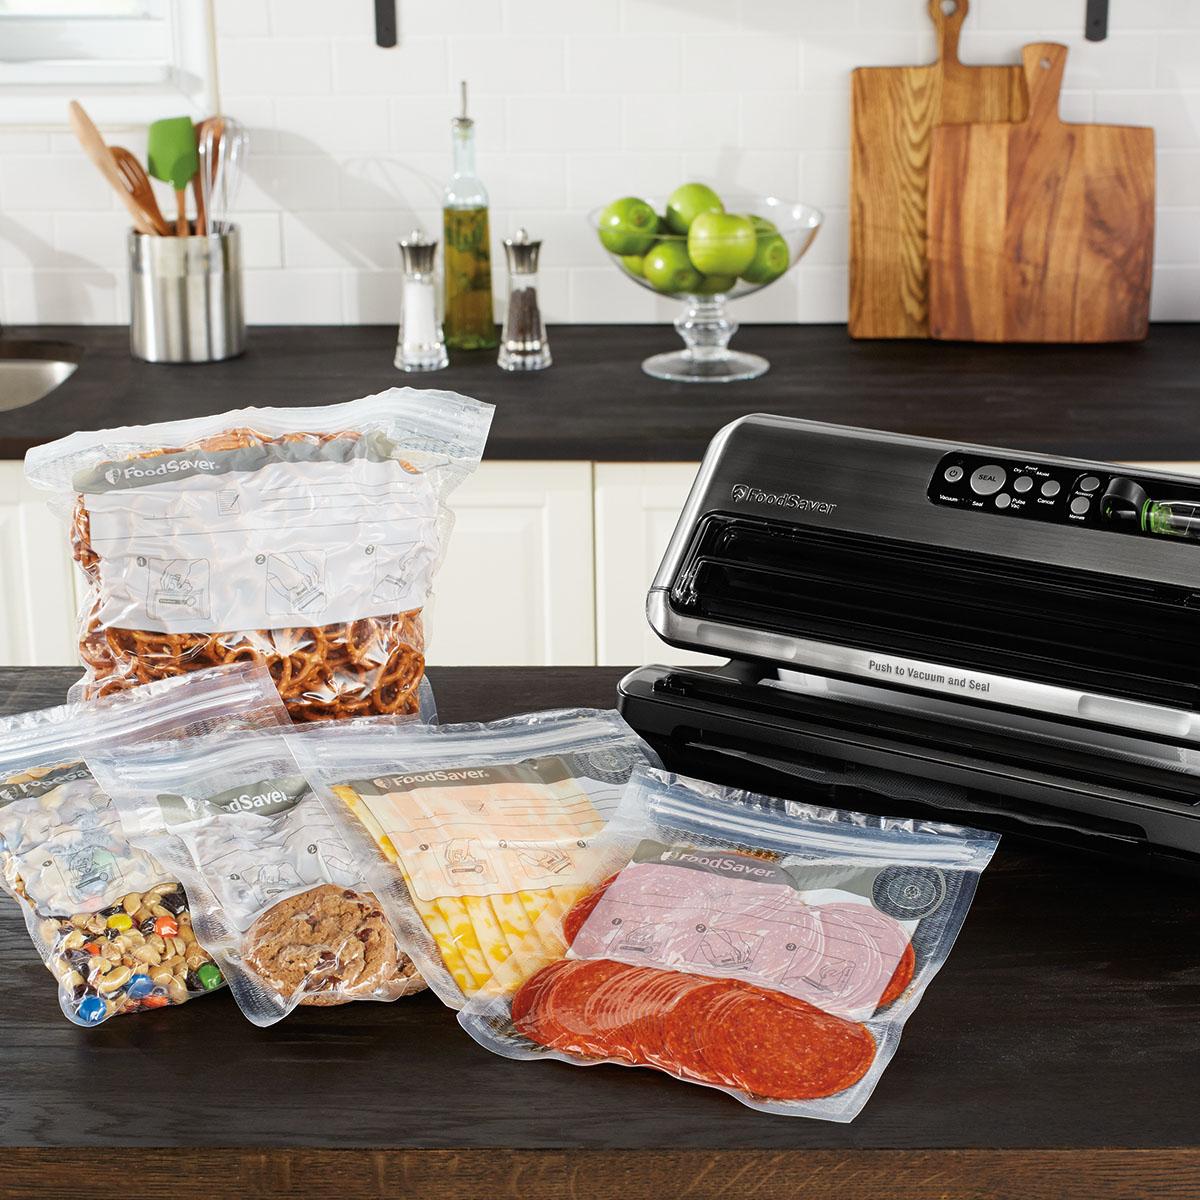 The FoodSaver FM5460 2-in-1 Food Preservation System FM5460-DTC 9